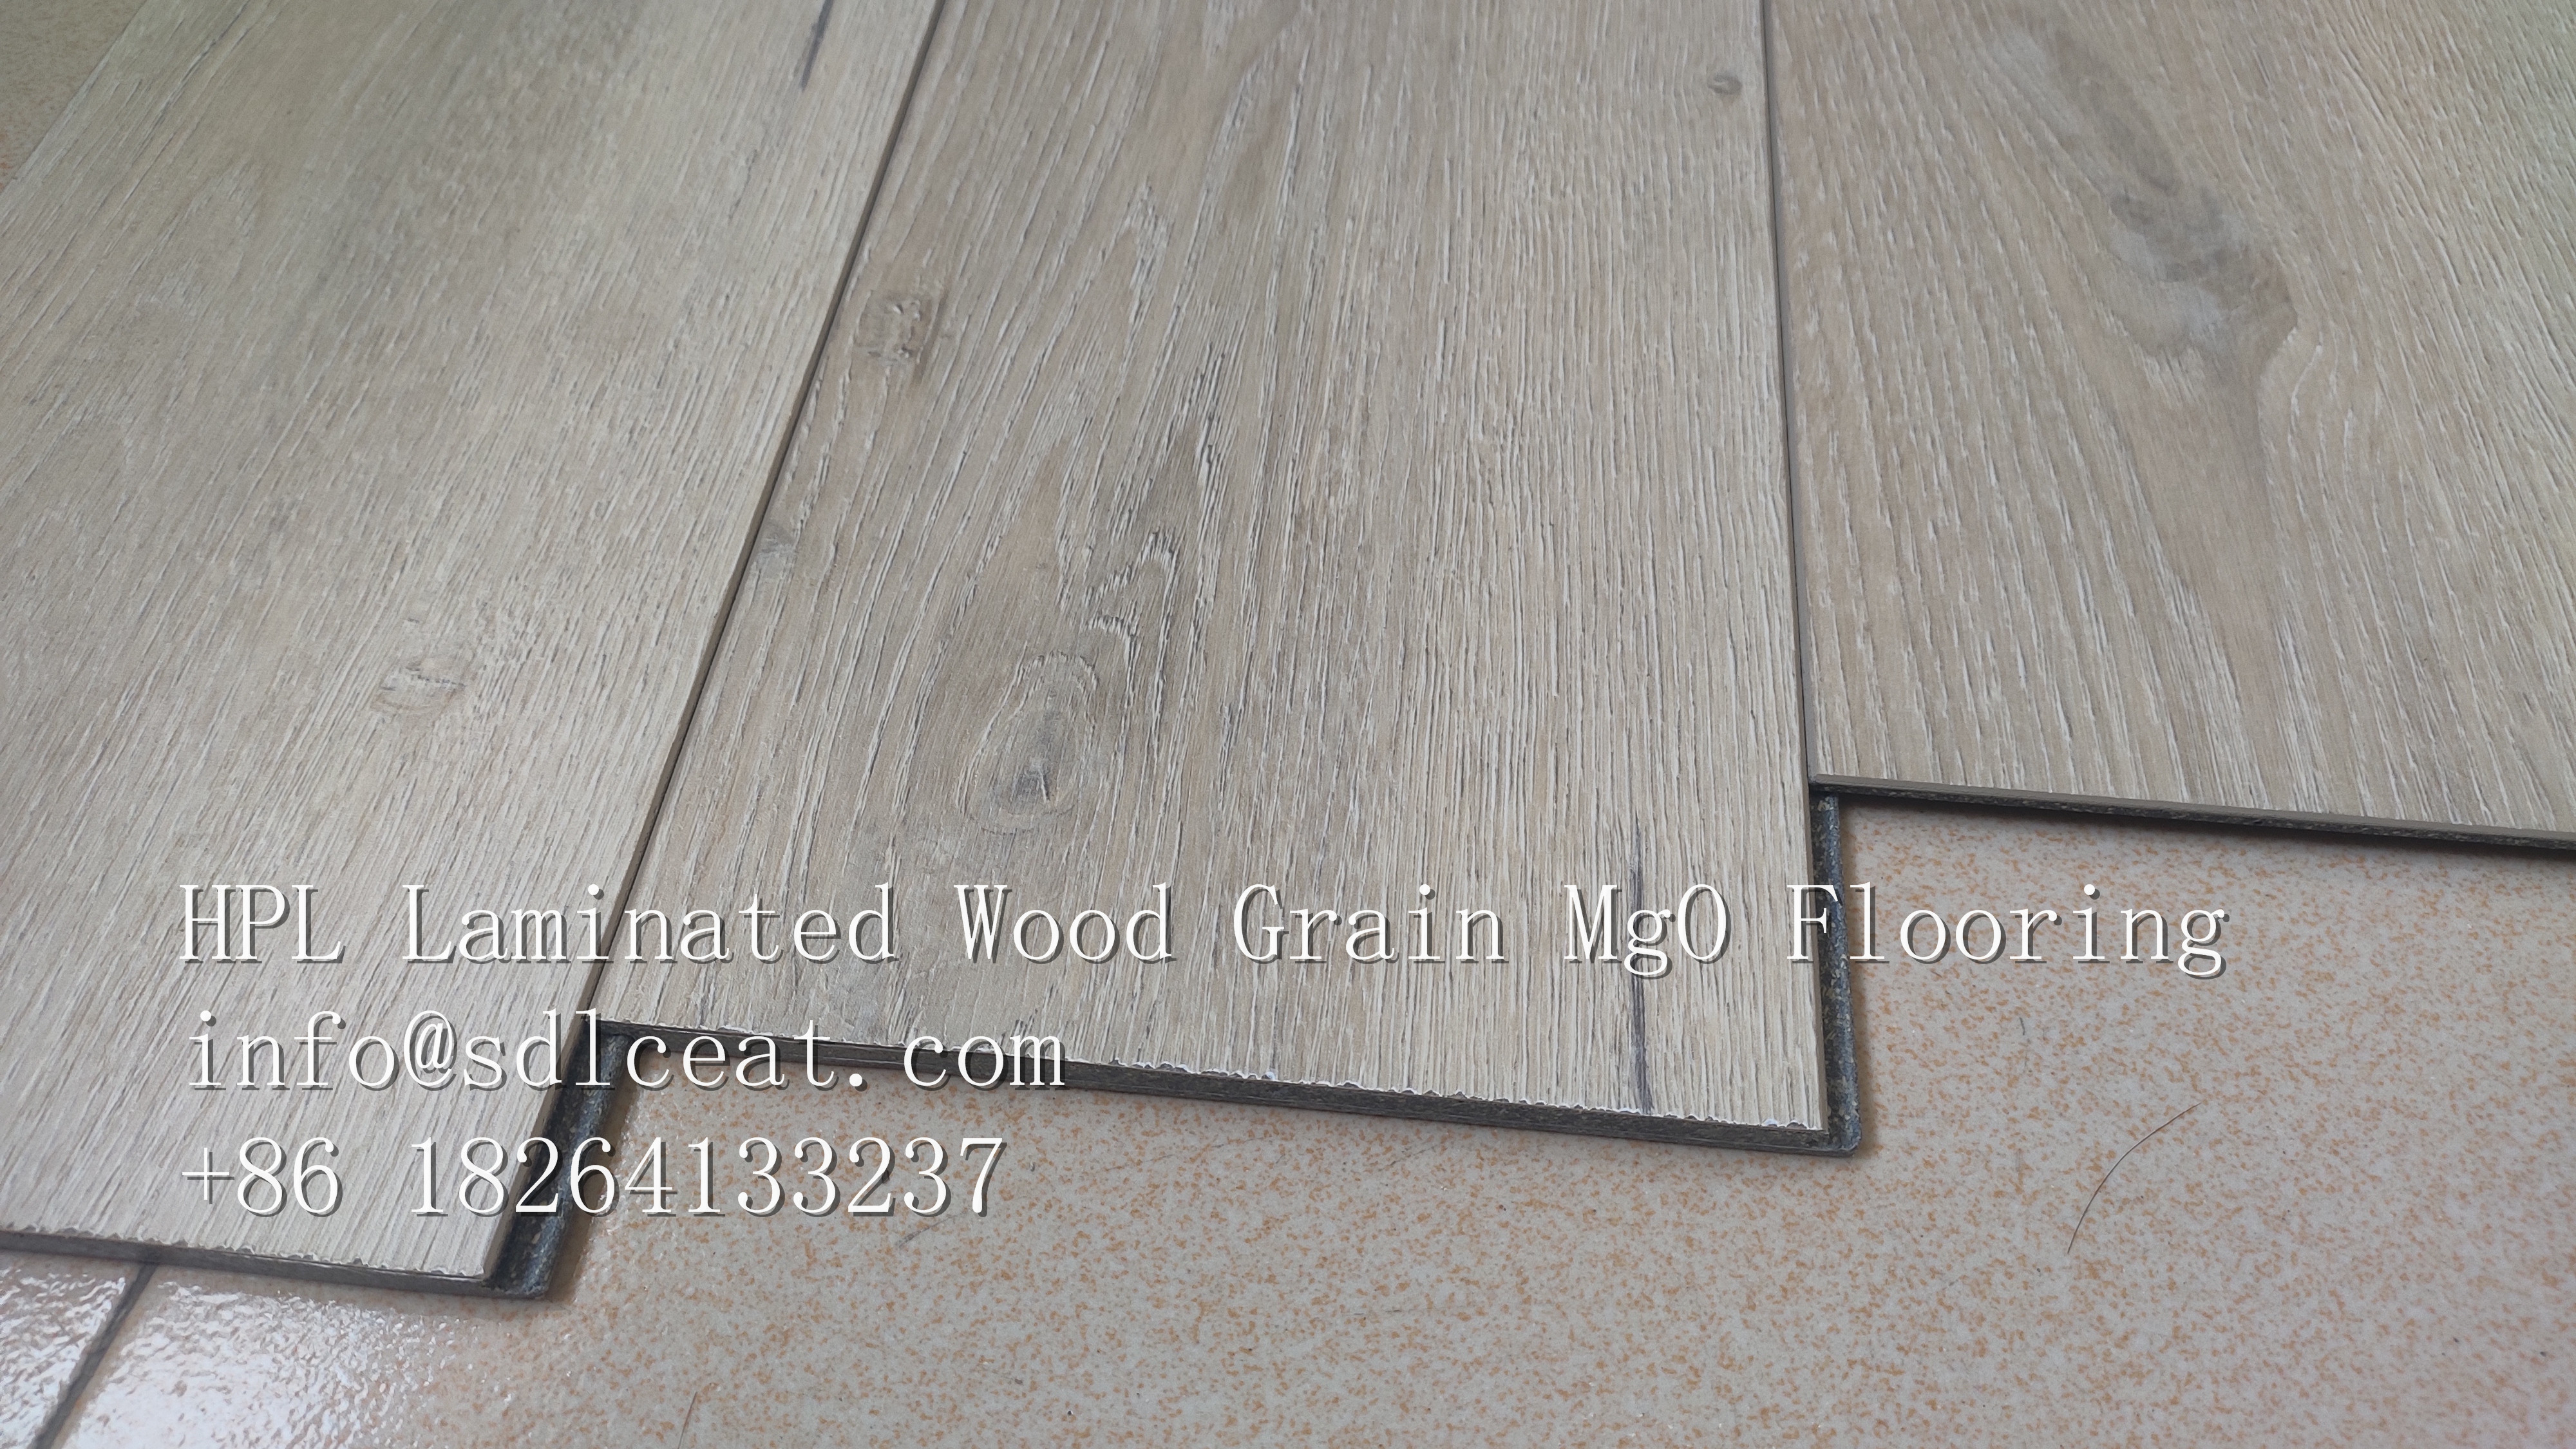 HPL MgO Flooring